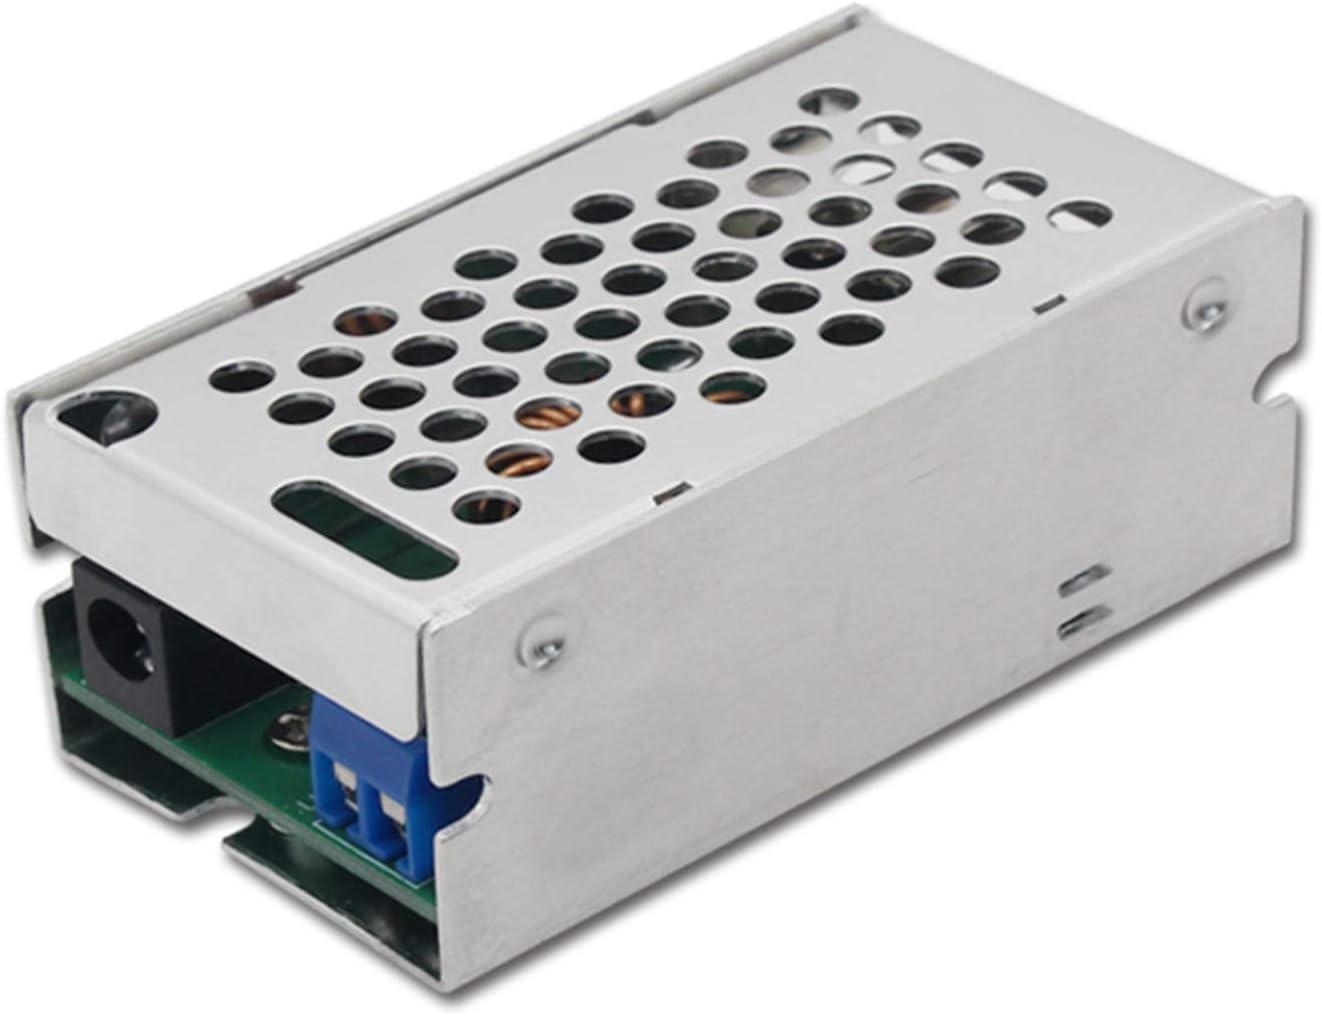 DC Converter 12V/24V to 5V 6A 30W USB Converter Buck Module, DC9V-35V to 5V Regulator Car Power Converter with 4 USB Output Power Adapter